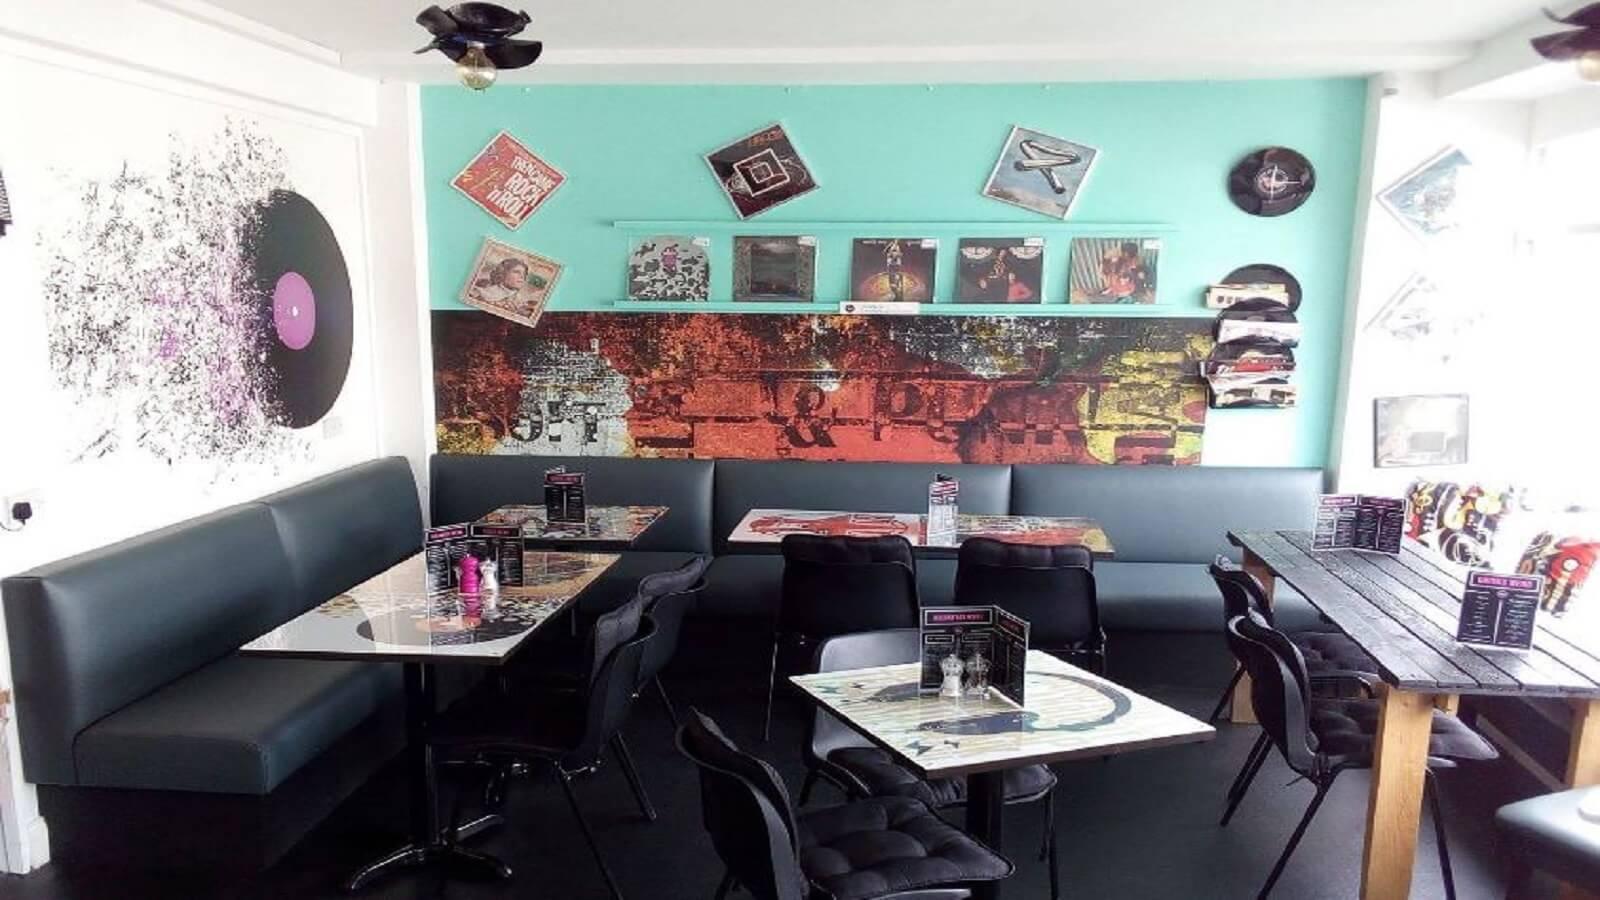 Viva-Vinyl Record Store & Cafe